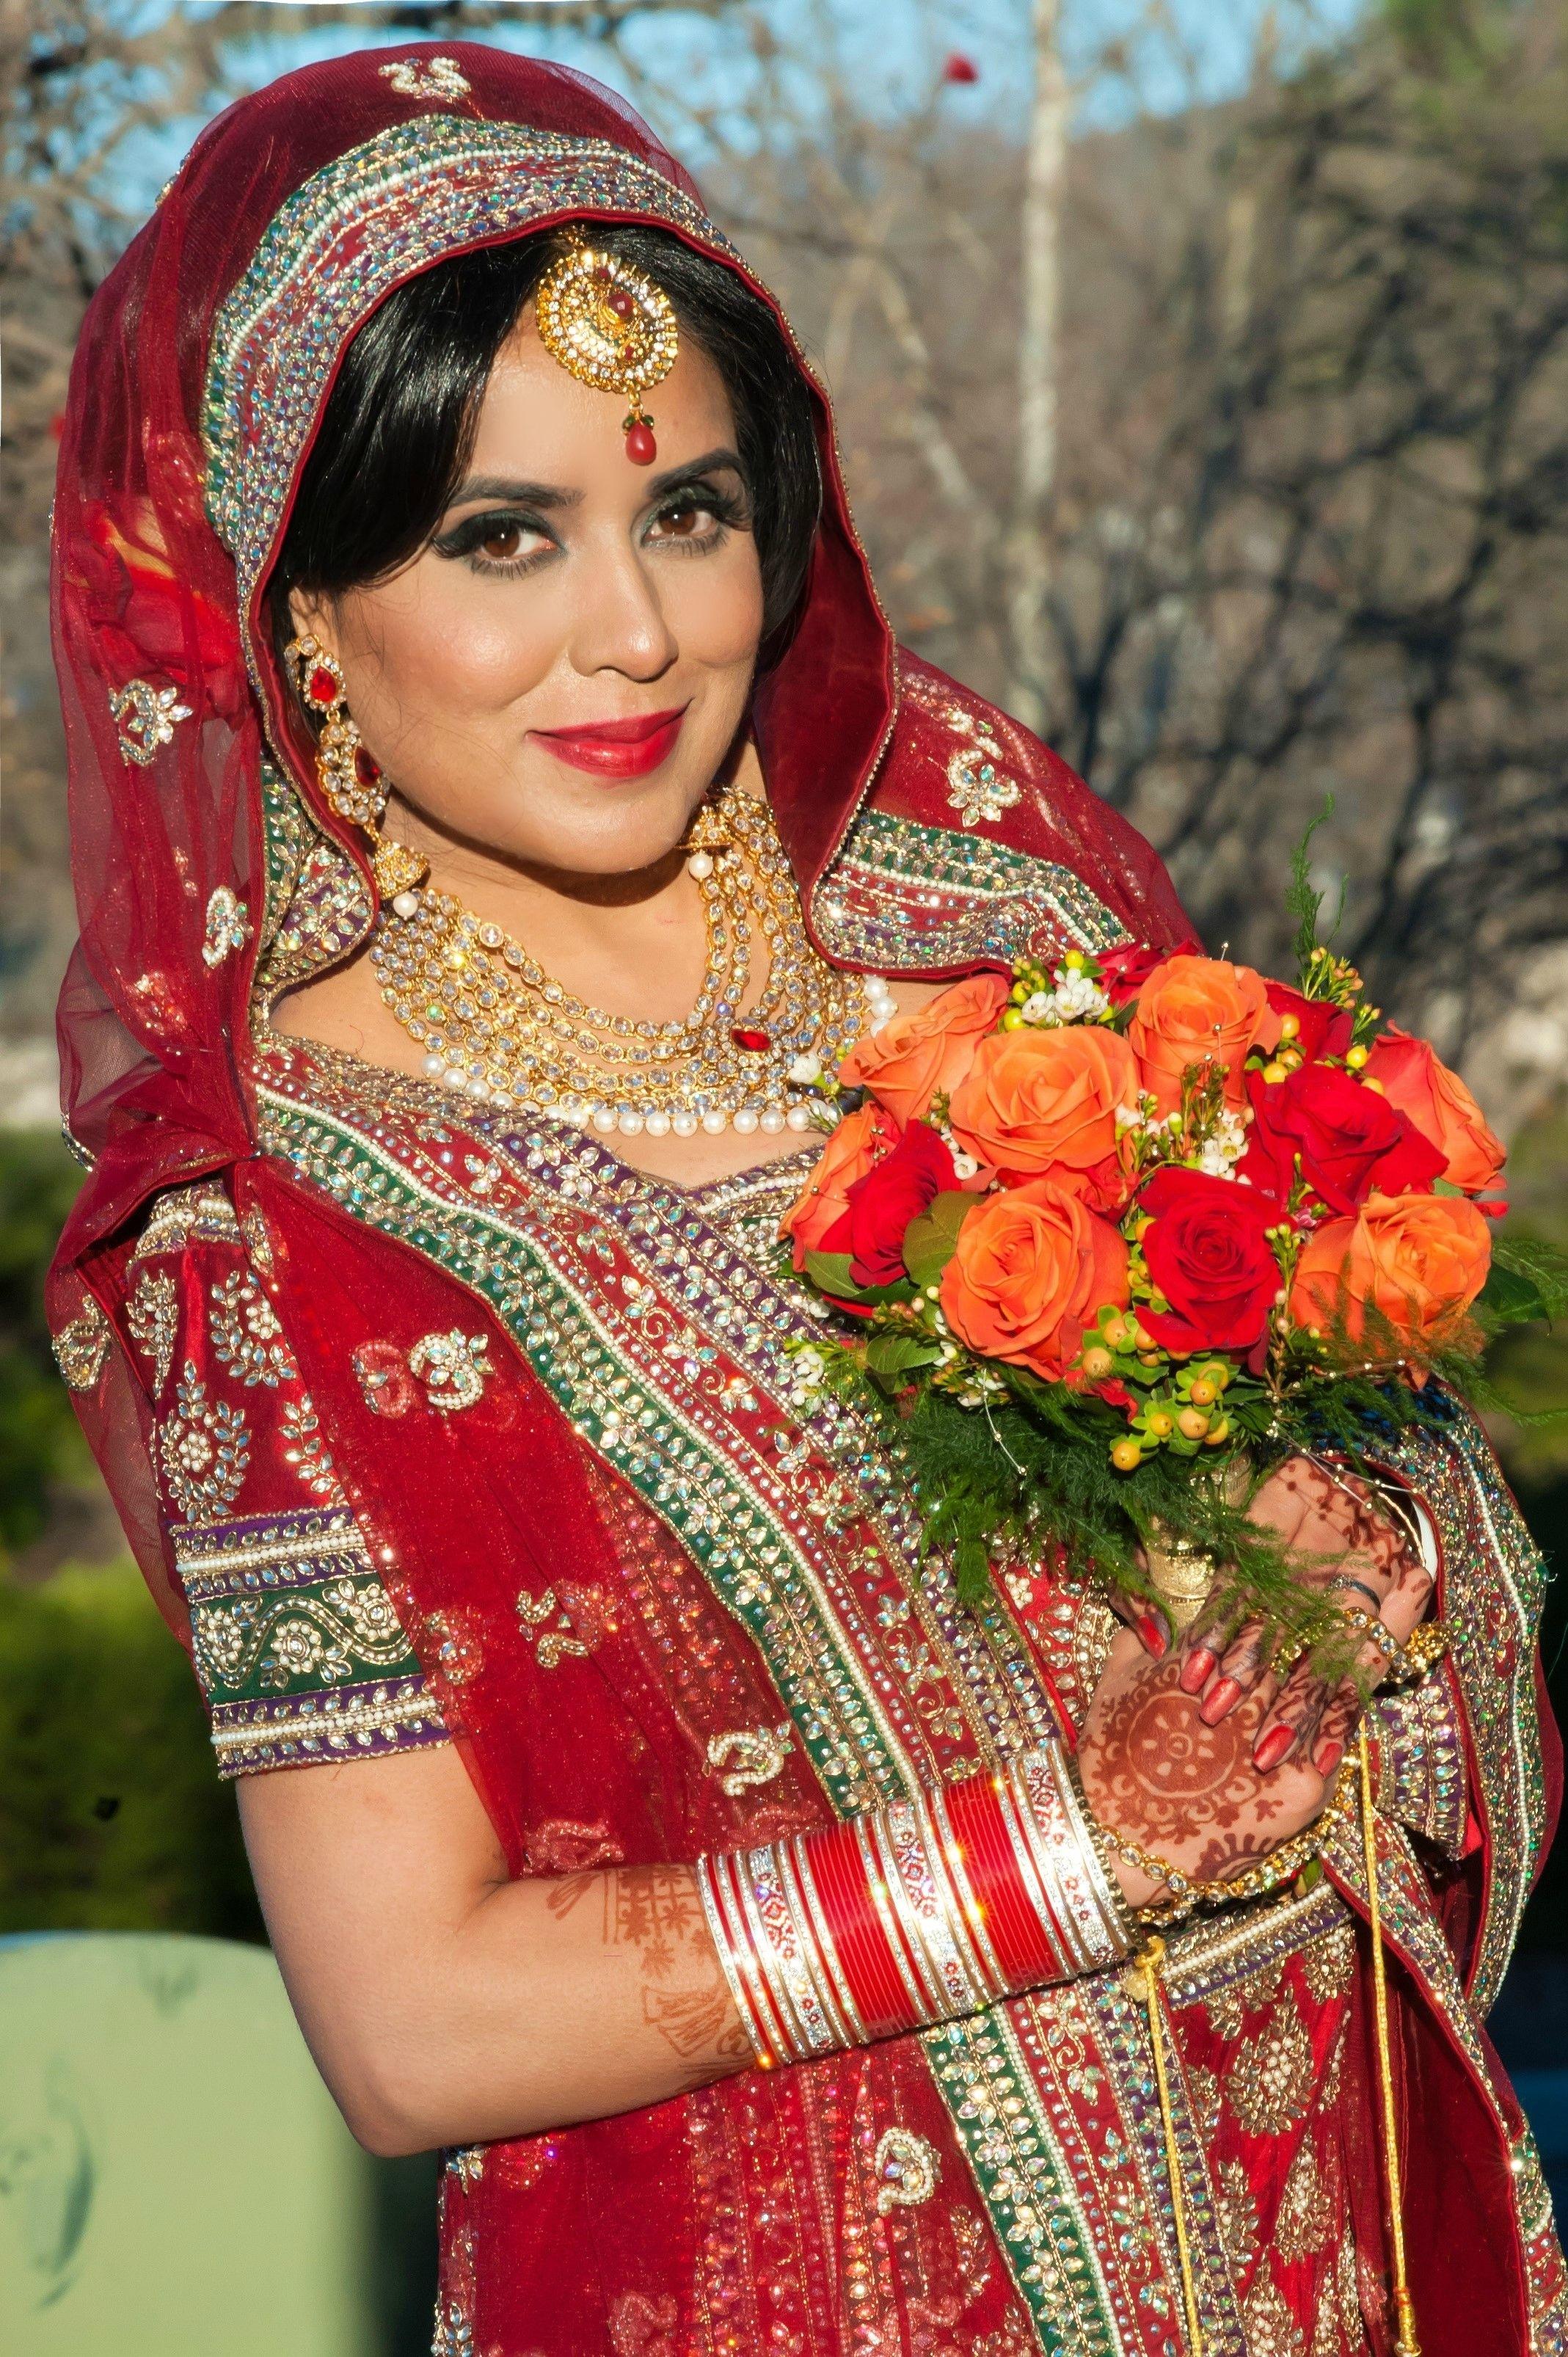 punjabi bridal makeup images – wavy haircut